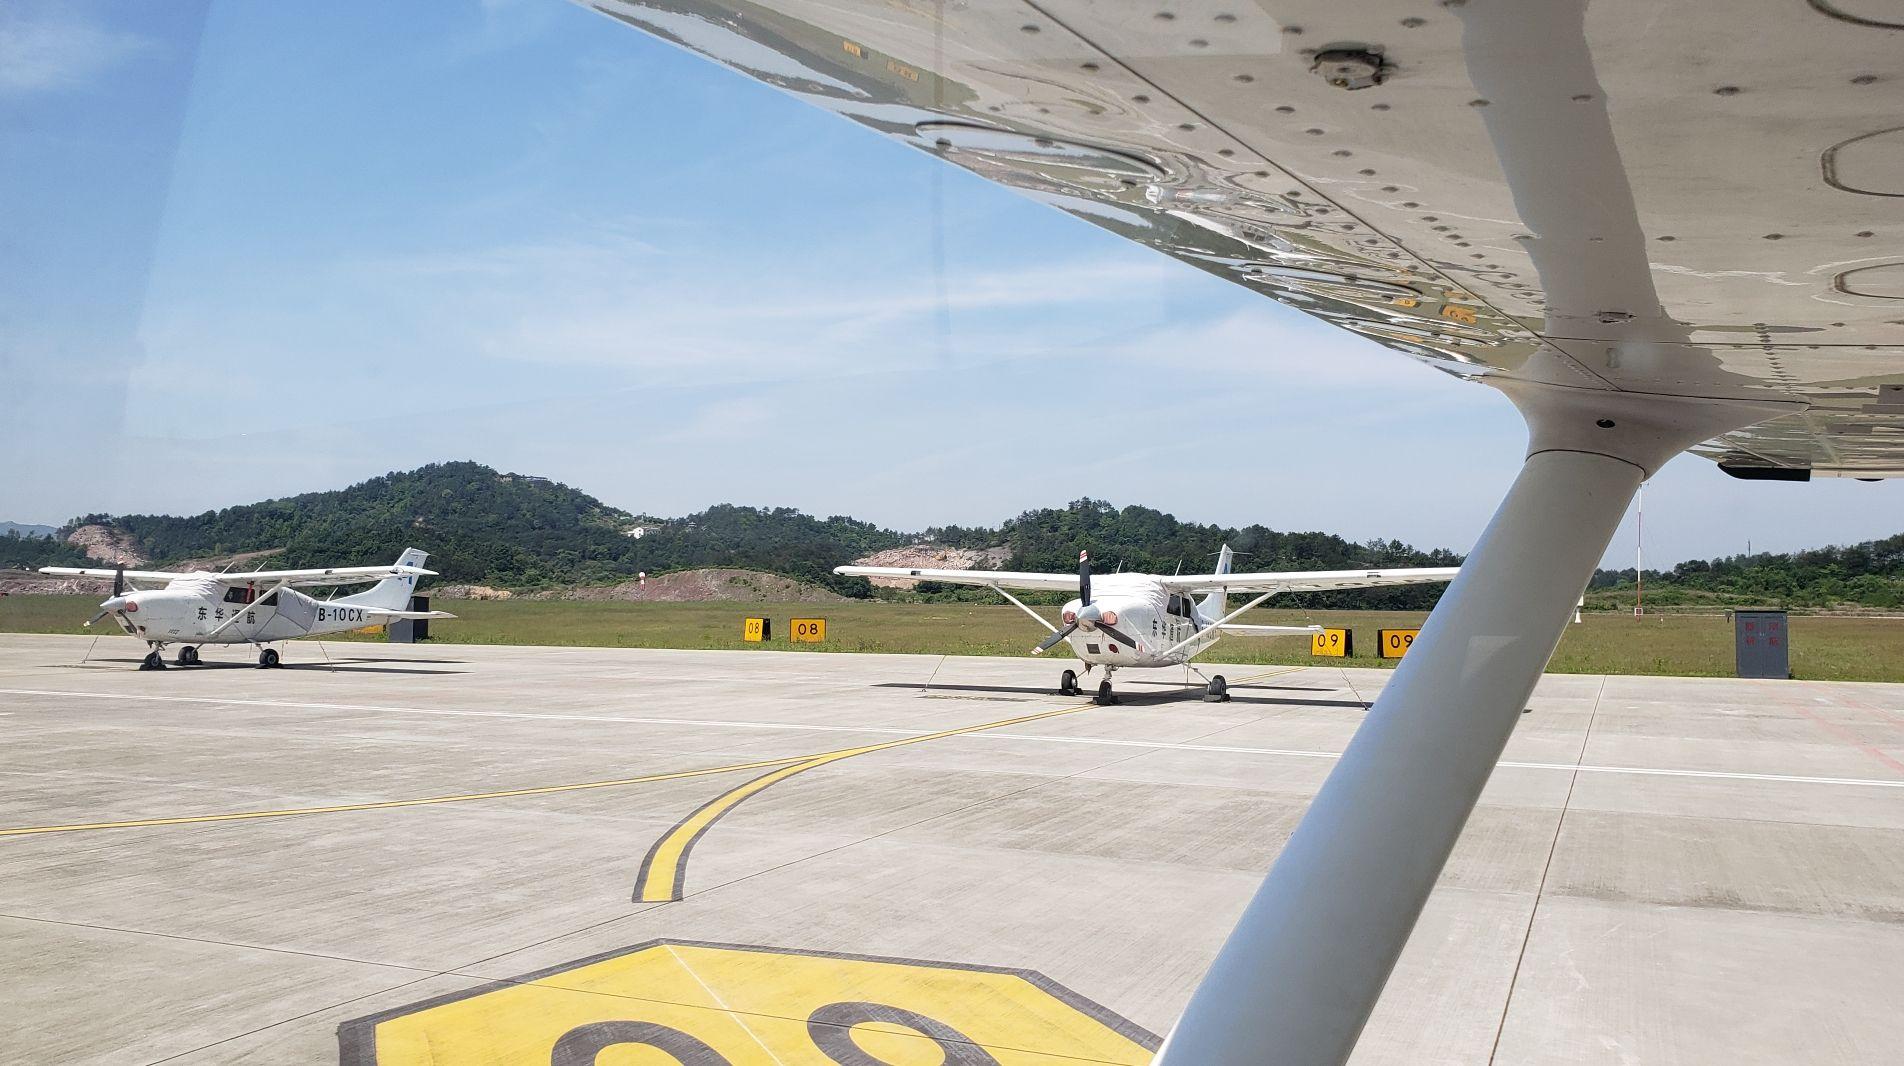 DongYangHengDianTongYong Airport